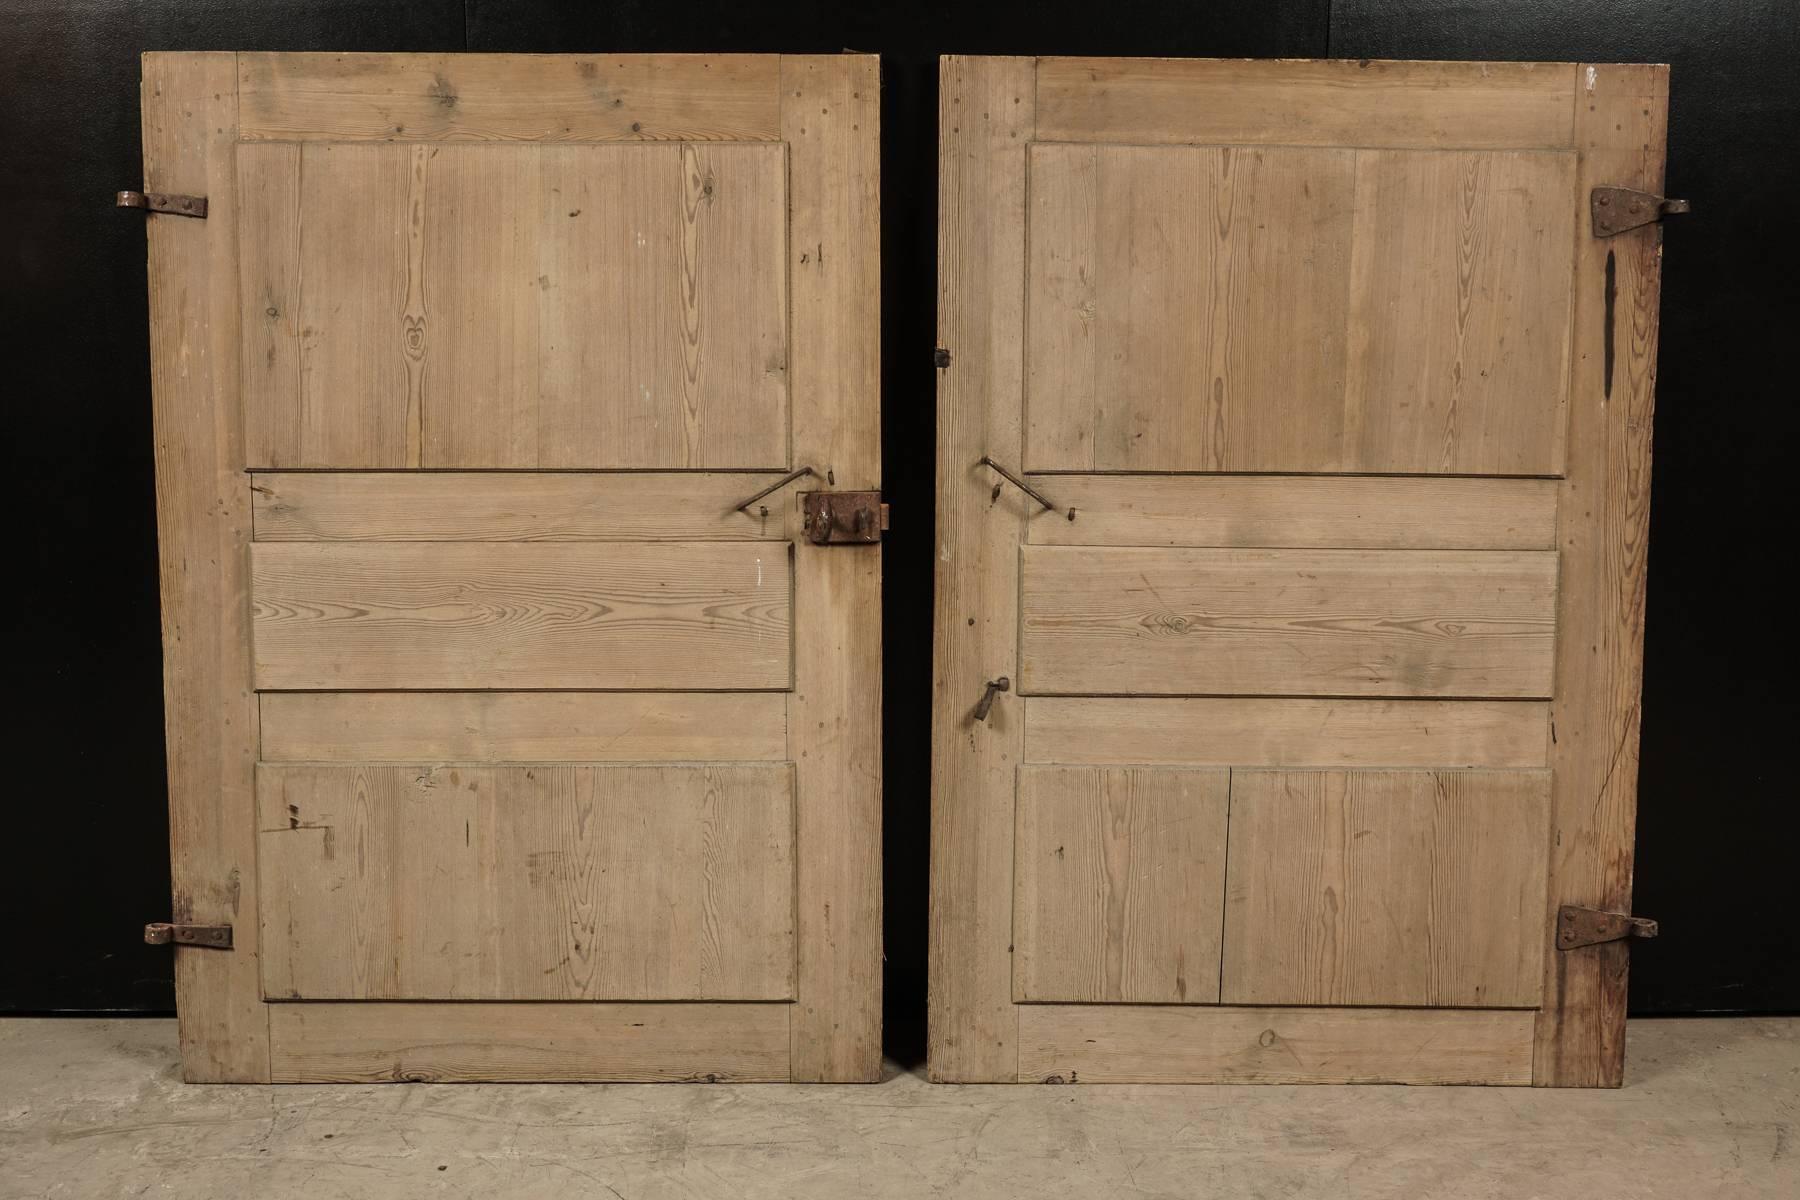 Pair of Primitive doors from Sweden circa 1820. Solid pine doors with original hardware & Pair of Primitive Doors from Sweden circa 1820 at 1stdibs